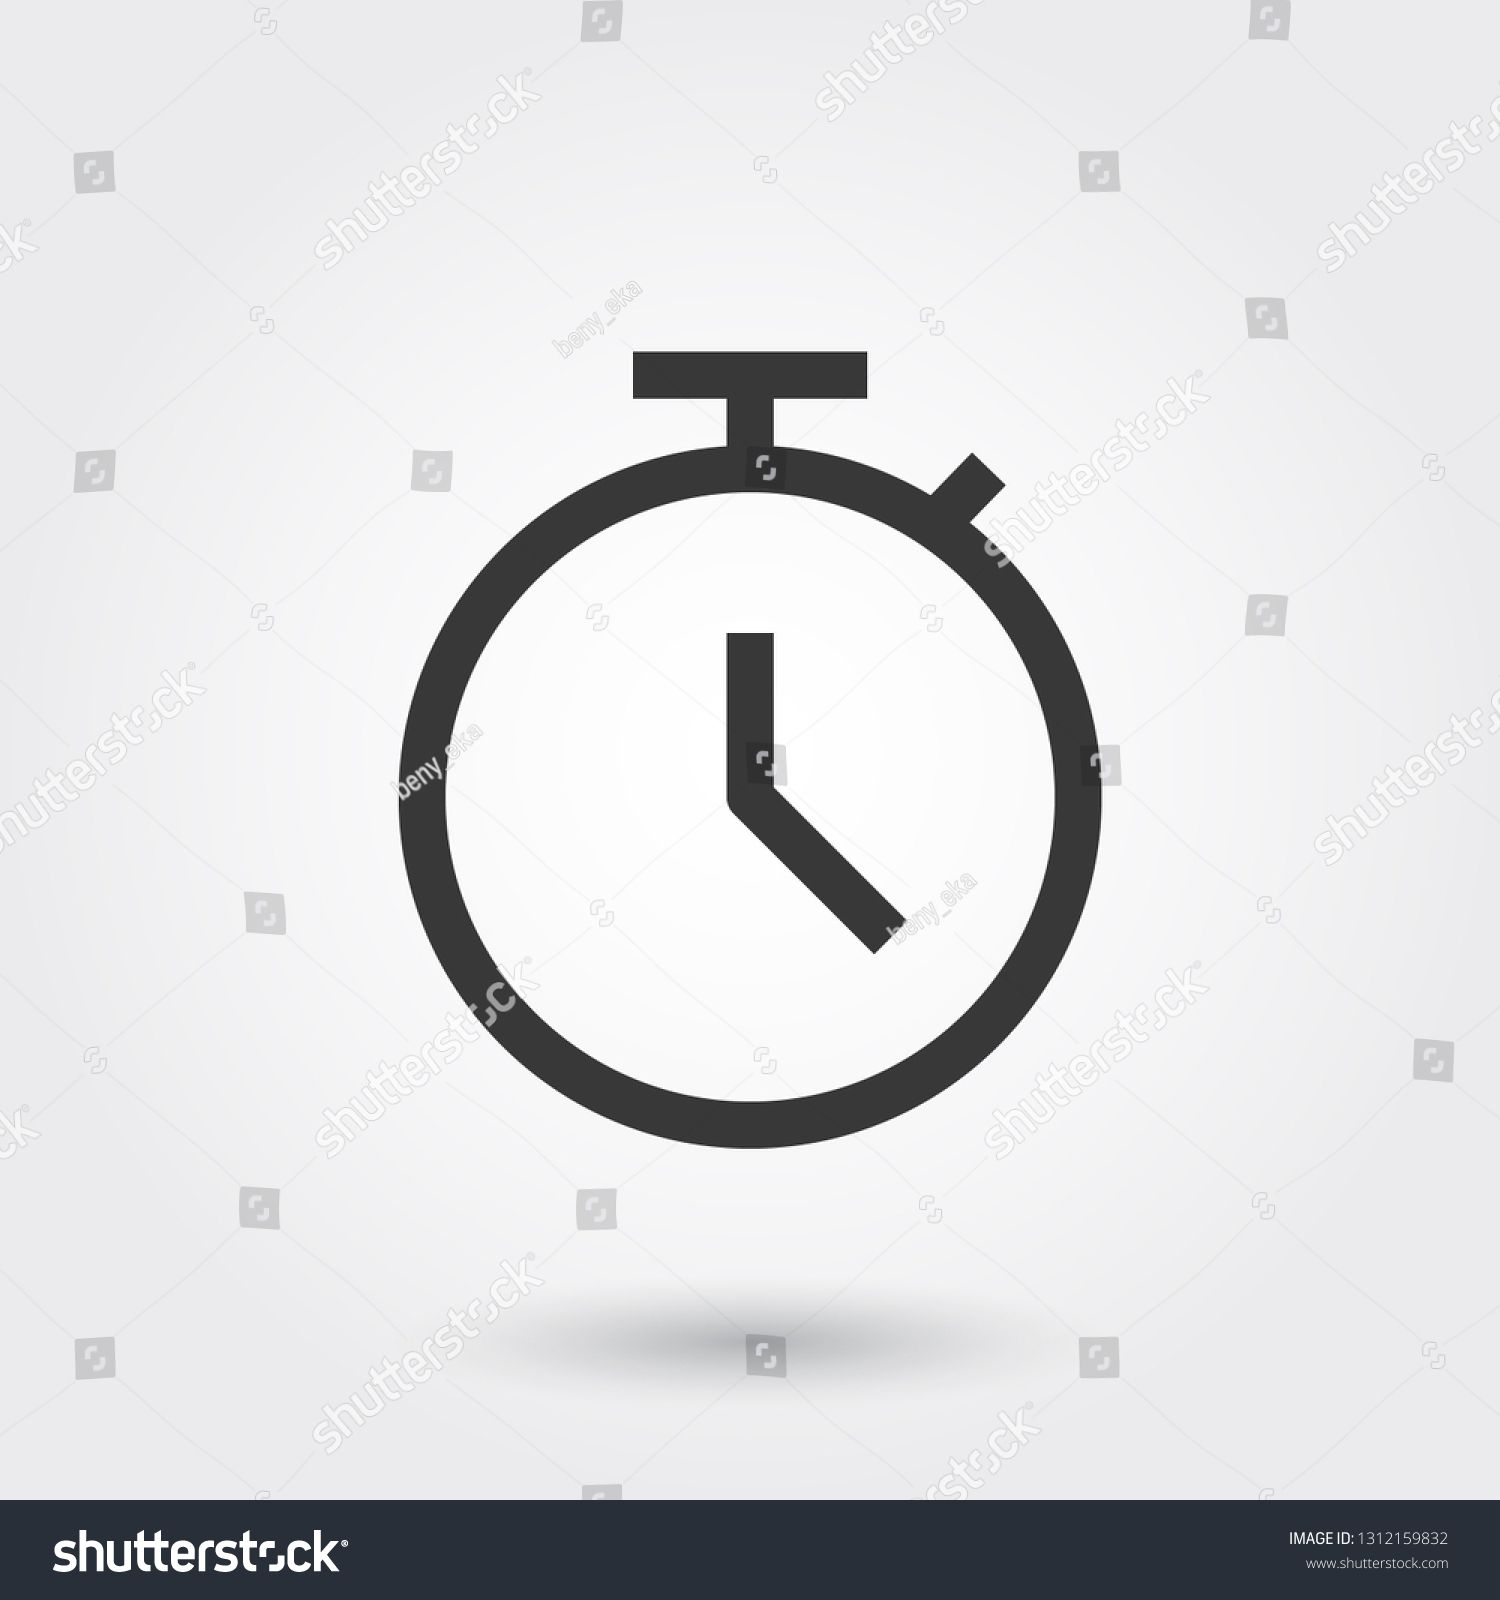 Vector, Deadline, Time, Clock, Watch, Line Icon with shadow #Ad , #AFFILIATE, #Time#Clock#Vector#Deadline